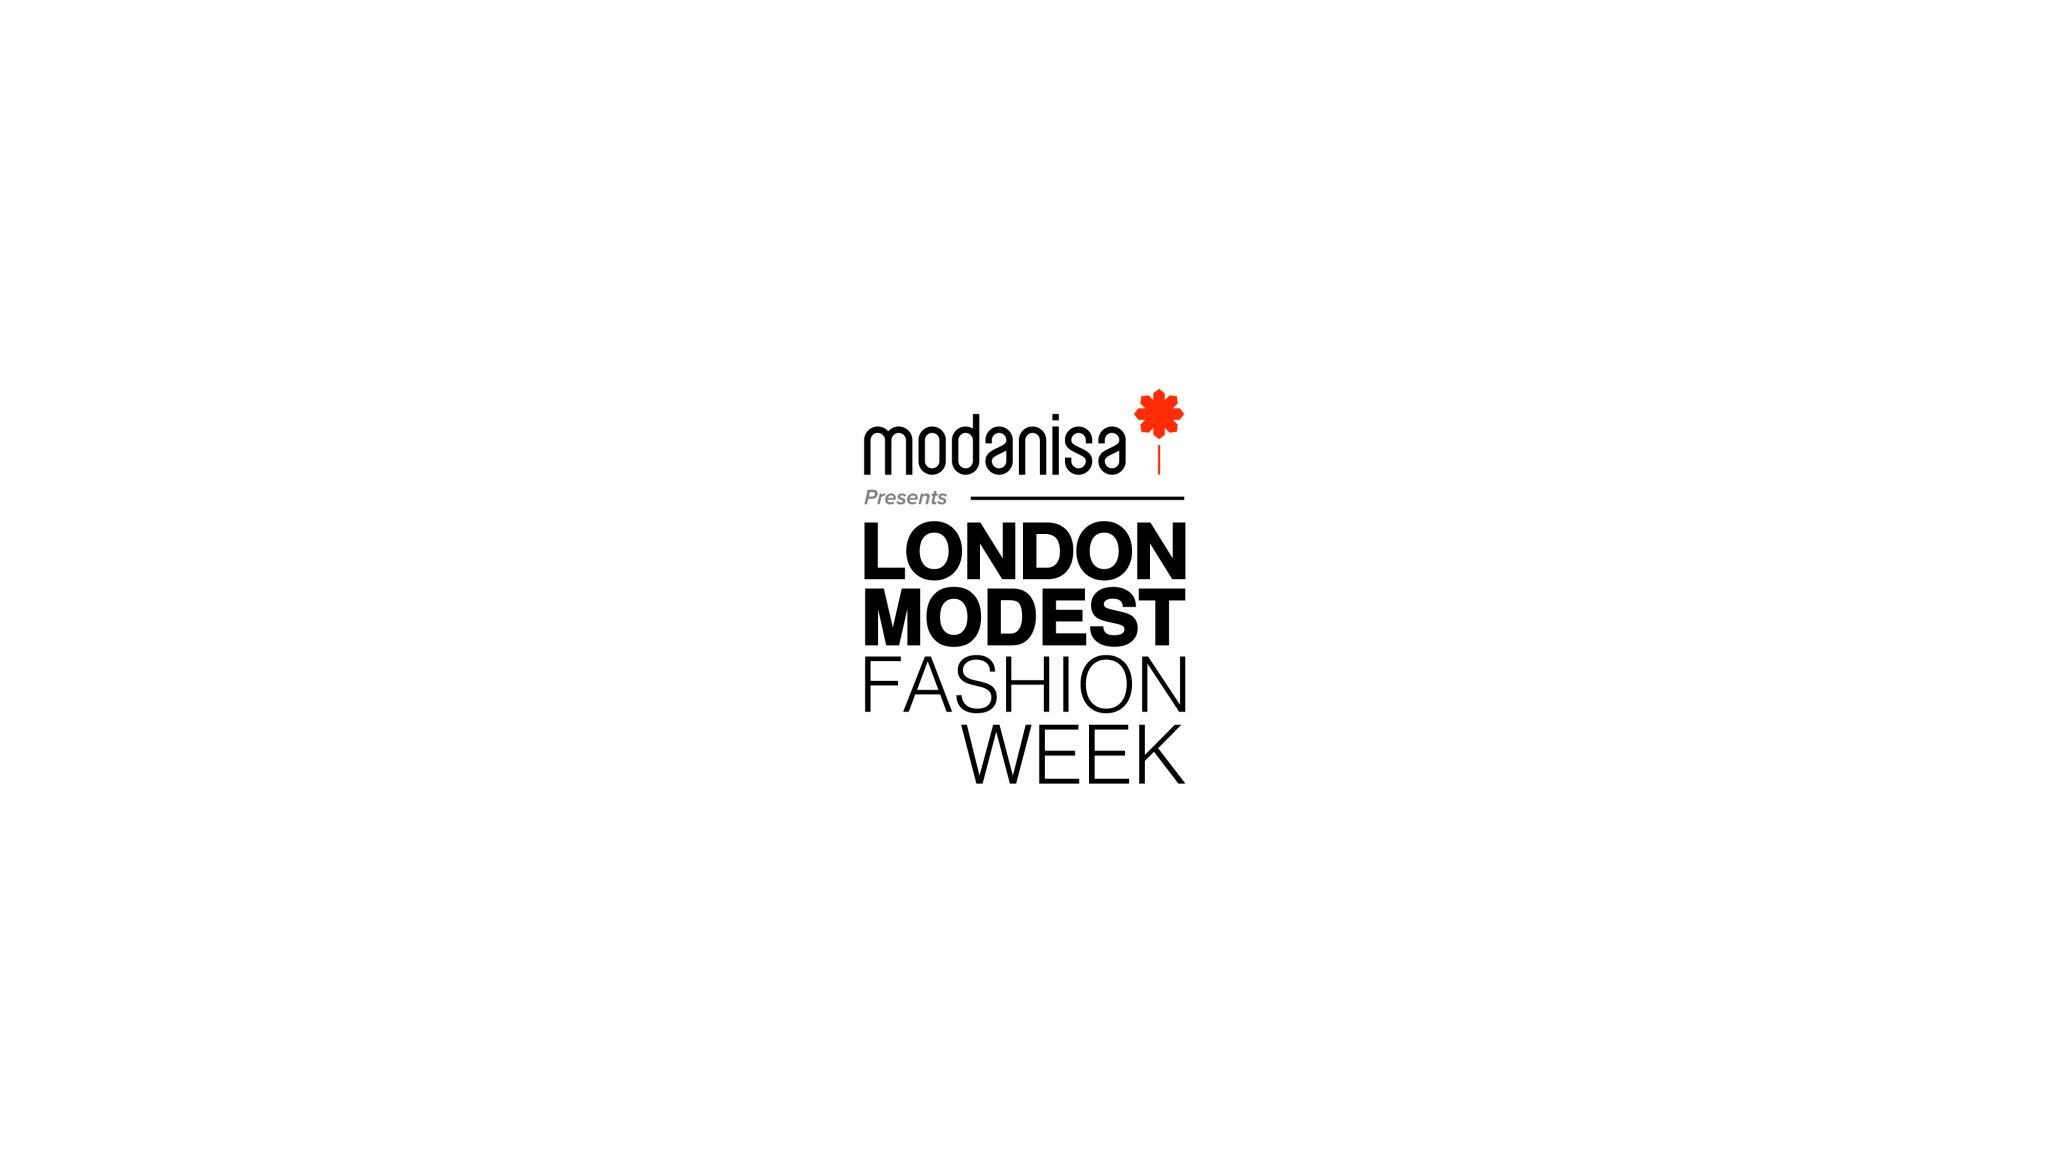 Modanisa London Modest Fashion Week 2017